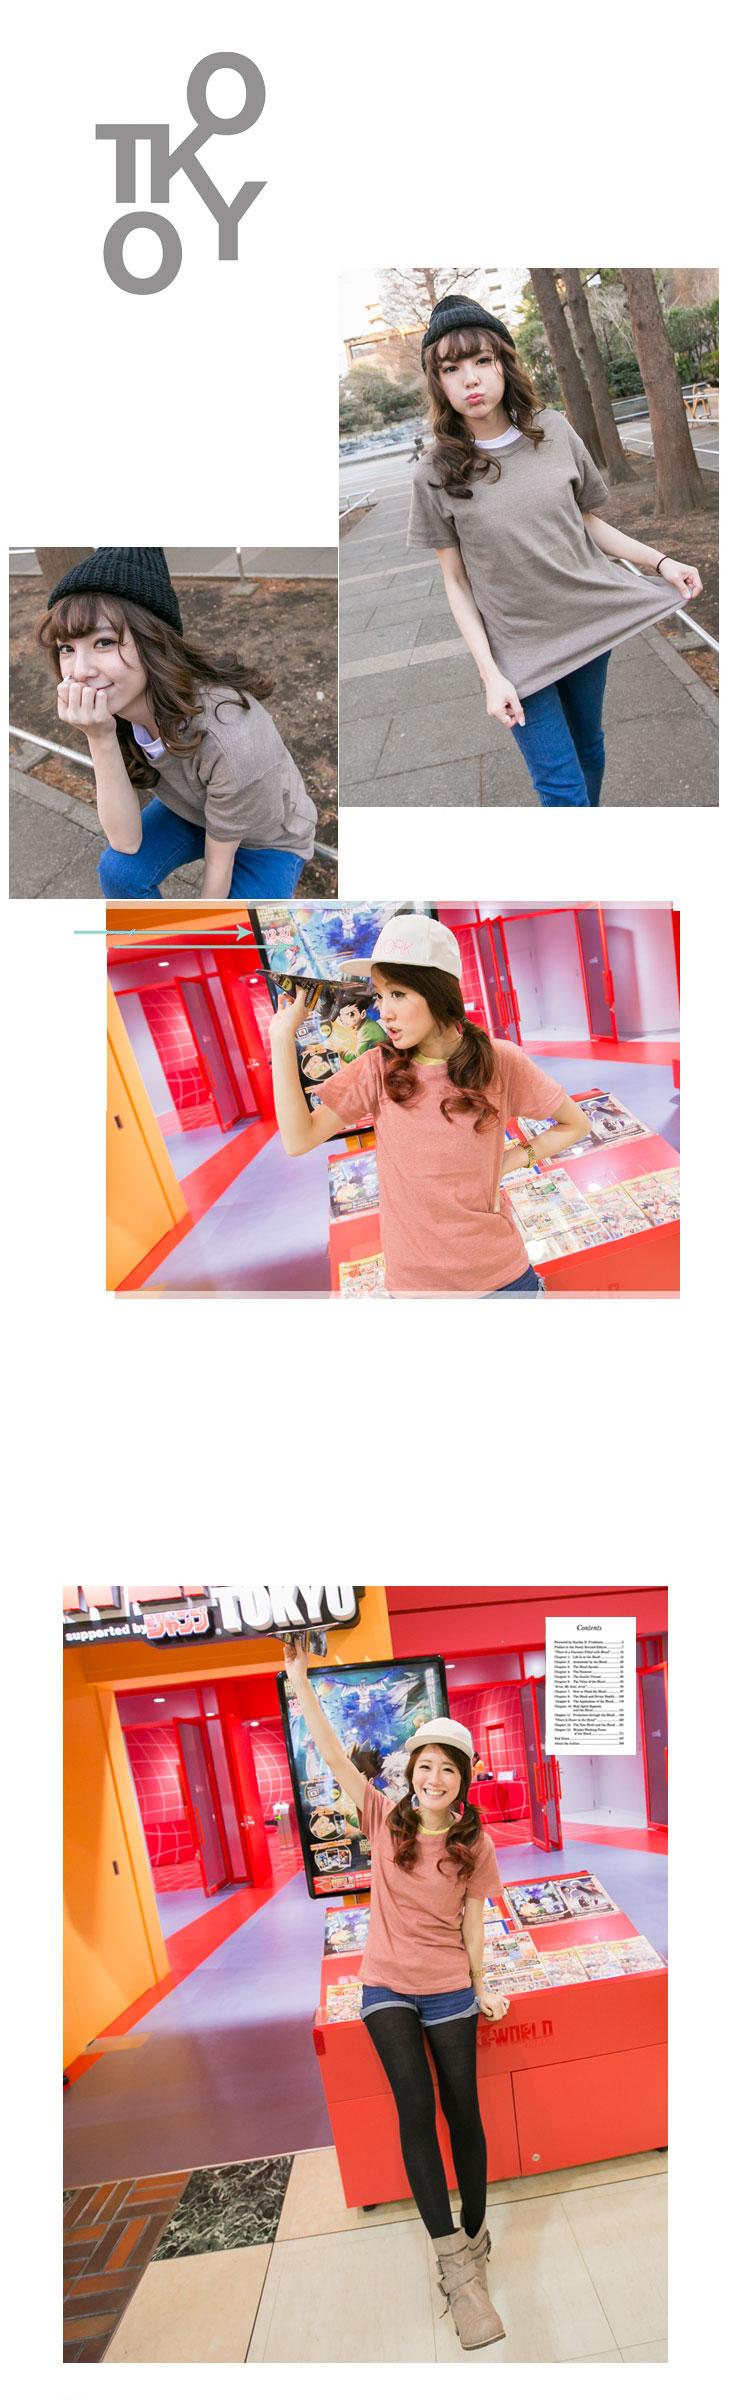 MIT台灣製 T恤 T-shirt 短T 情侶T恤 短袖T恤 素色圓領素雅T 班服 情侶裝【J5671】艾咪E舖